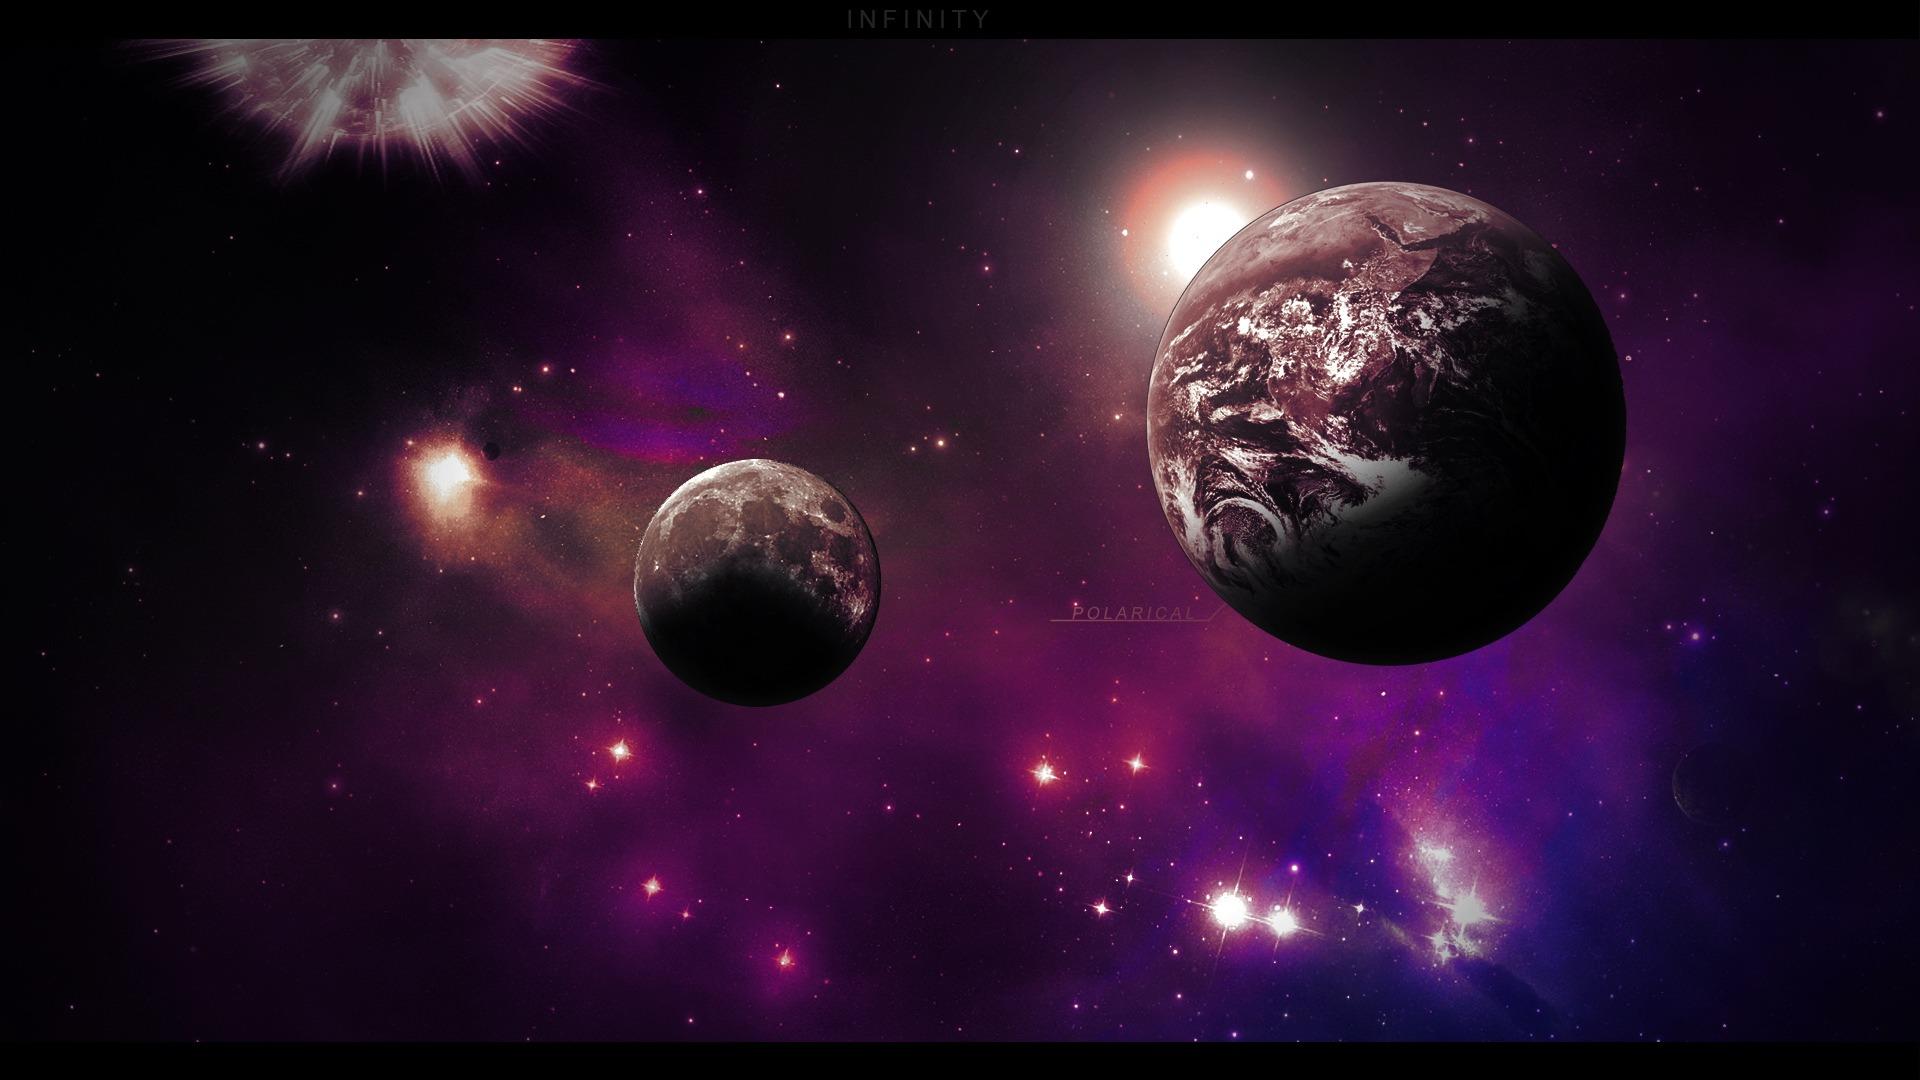 Aesthetic Dream Space Hd Desktop Wallpaper 01 Preview